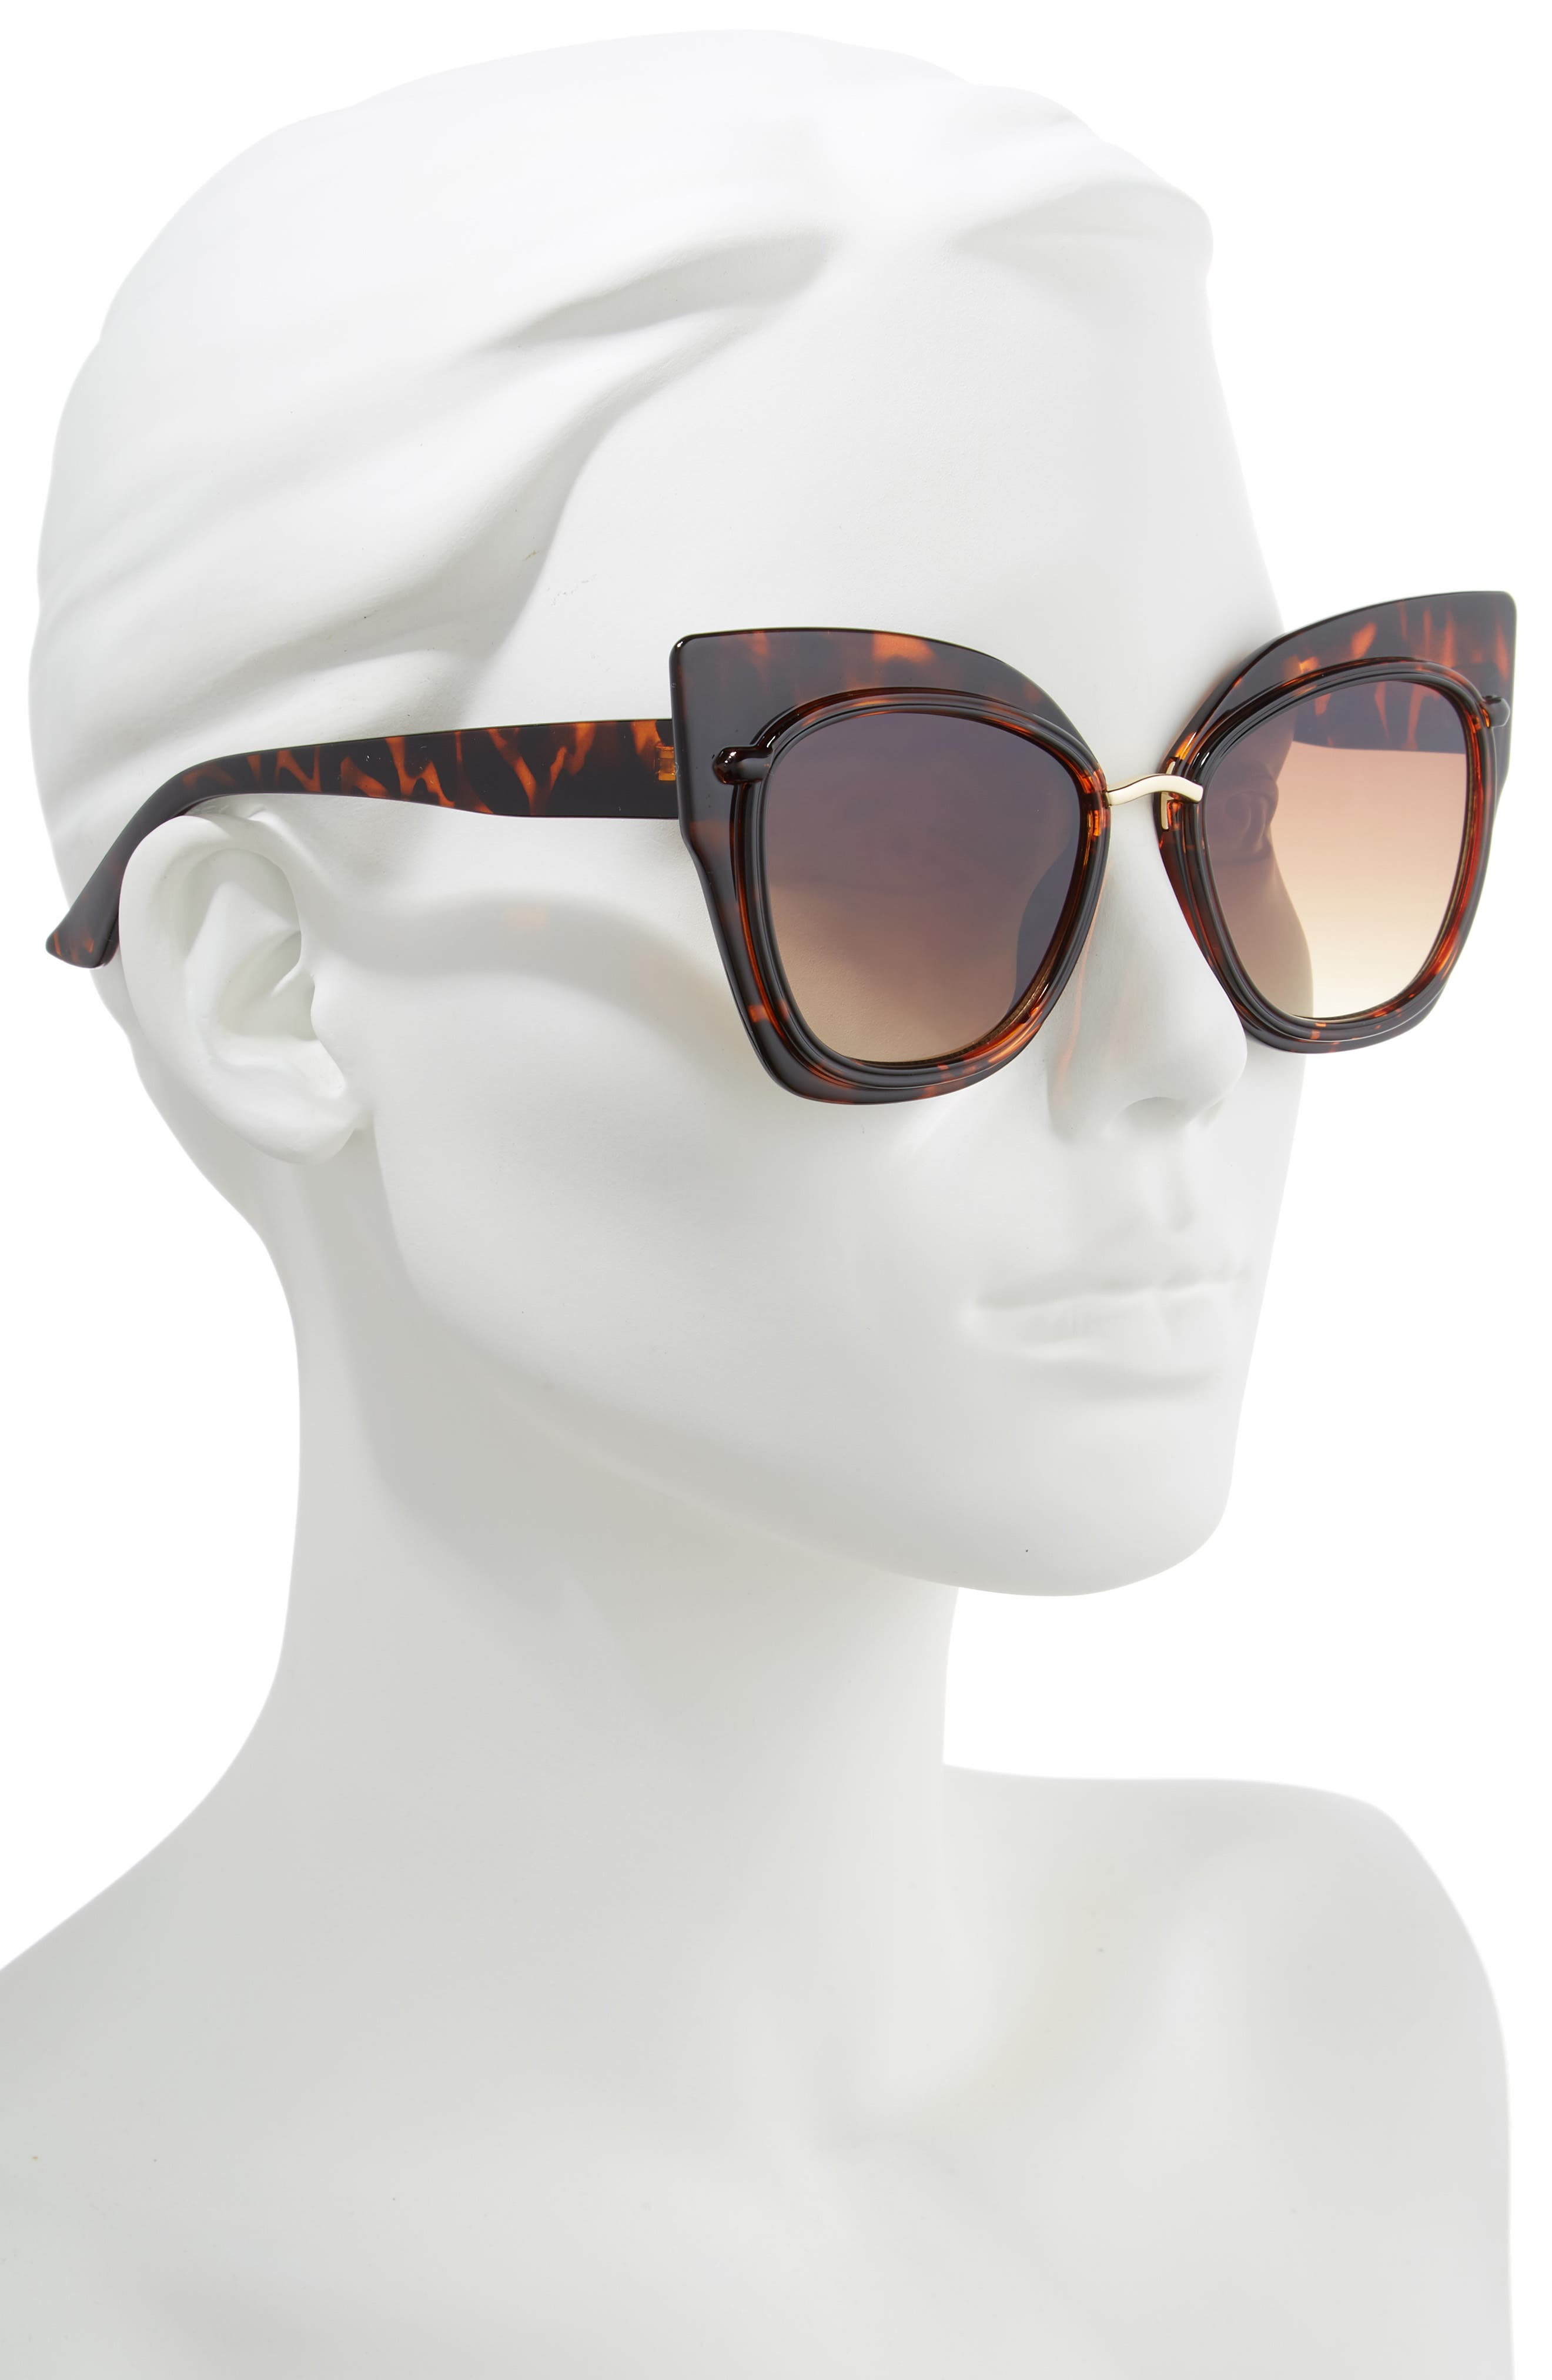 55mm Dual Oversized Cat Eye Sunglasses,                             Alternate thumbnail 2, color,                             200